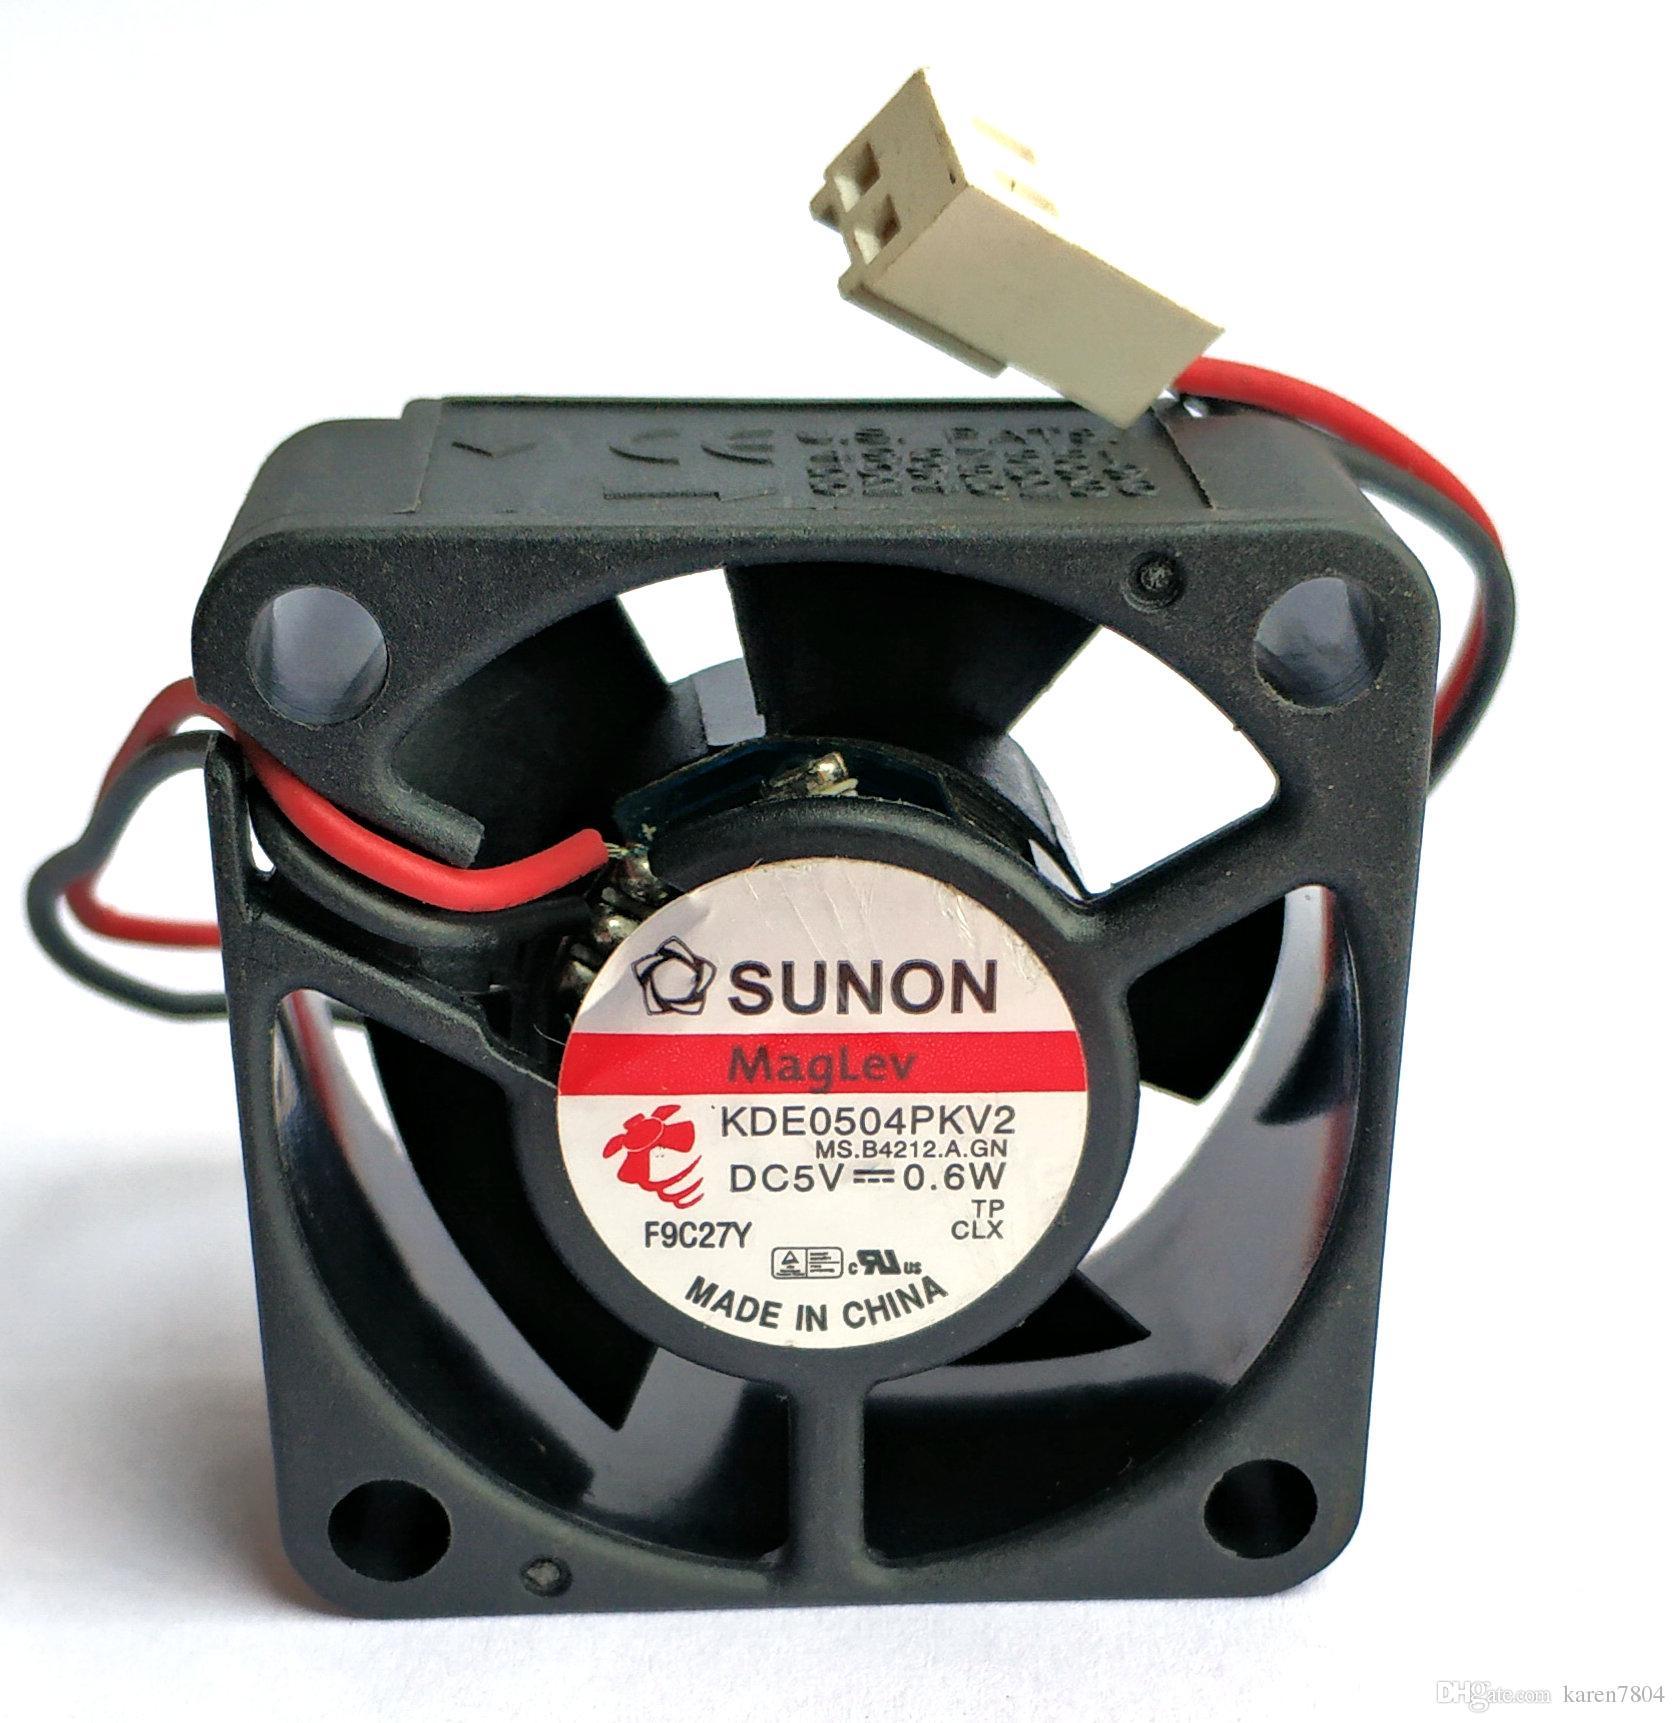 Original SUNON KDE0504PKV2 MS.A.GN 4020 5V 0.6W 4cm 2 wires computer cooling fan